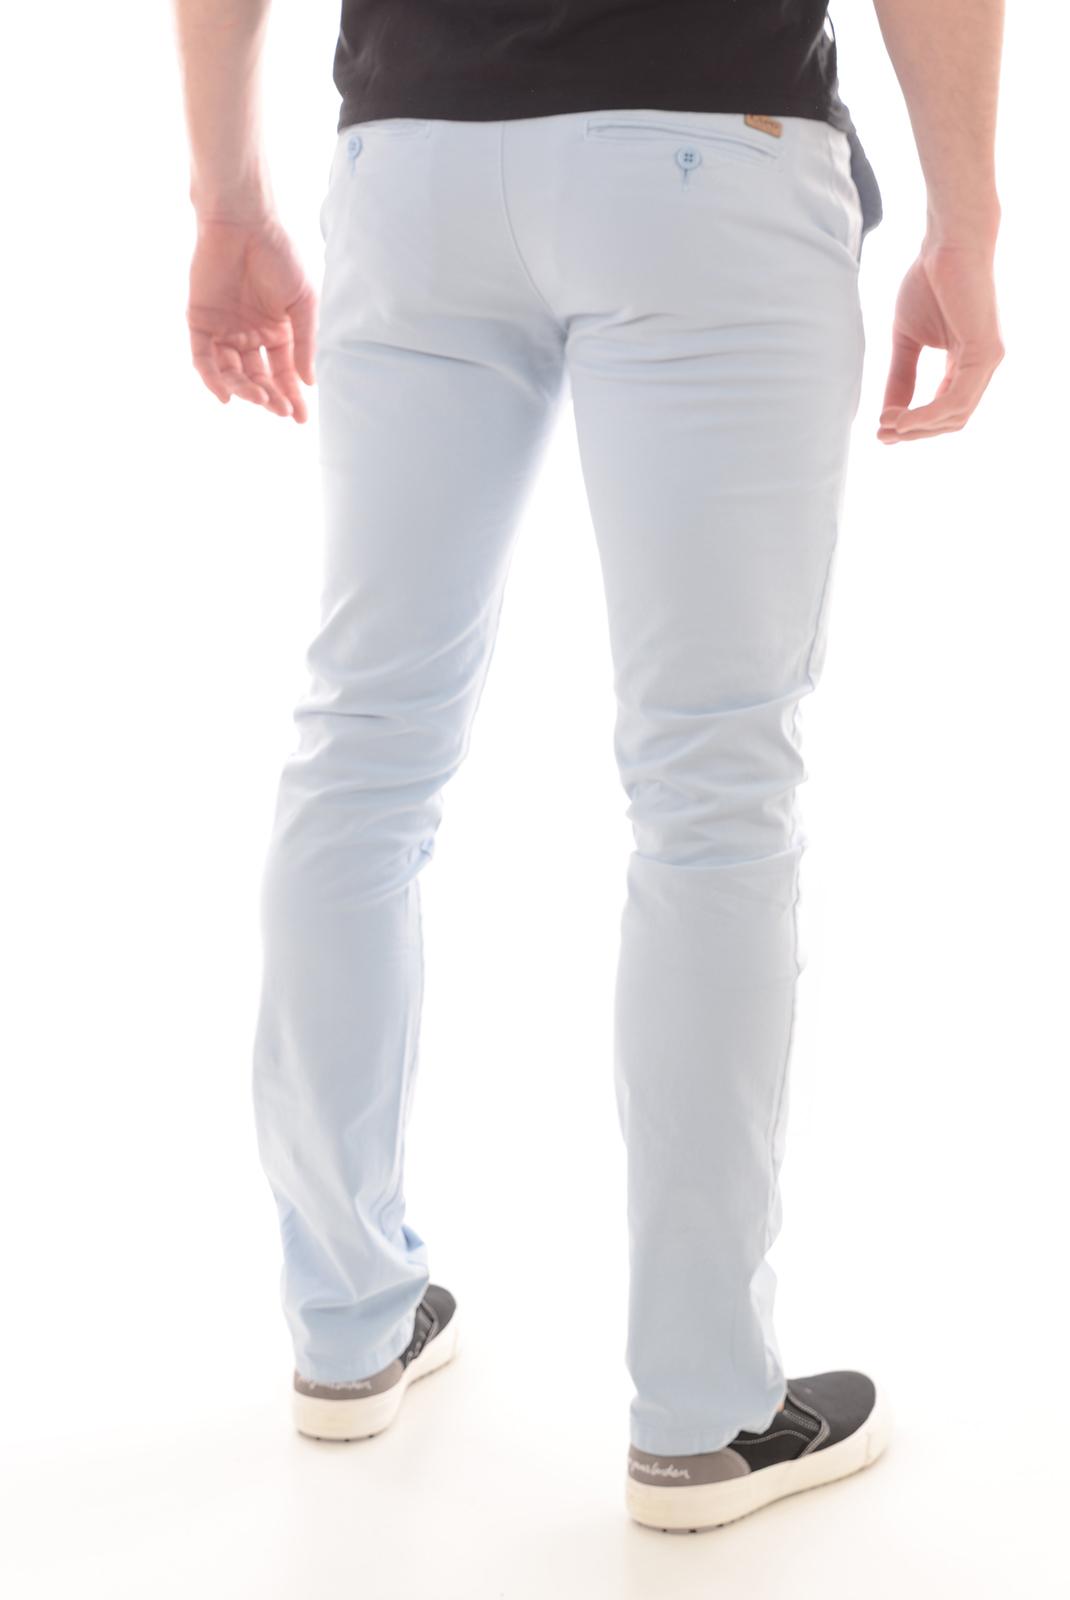 Pantalons  Capo classic wear CLASSIC WEAR BLEU CIEL